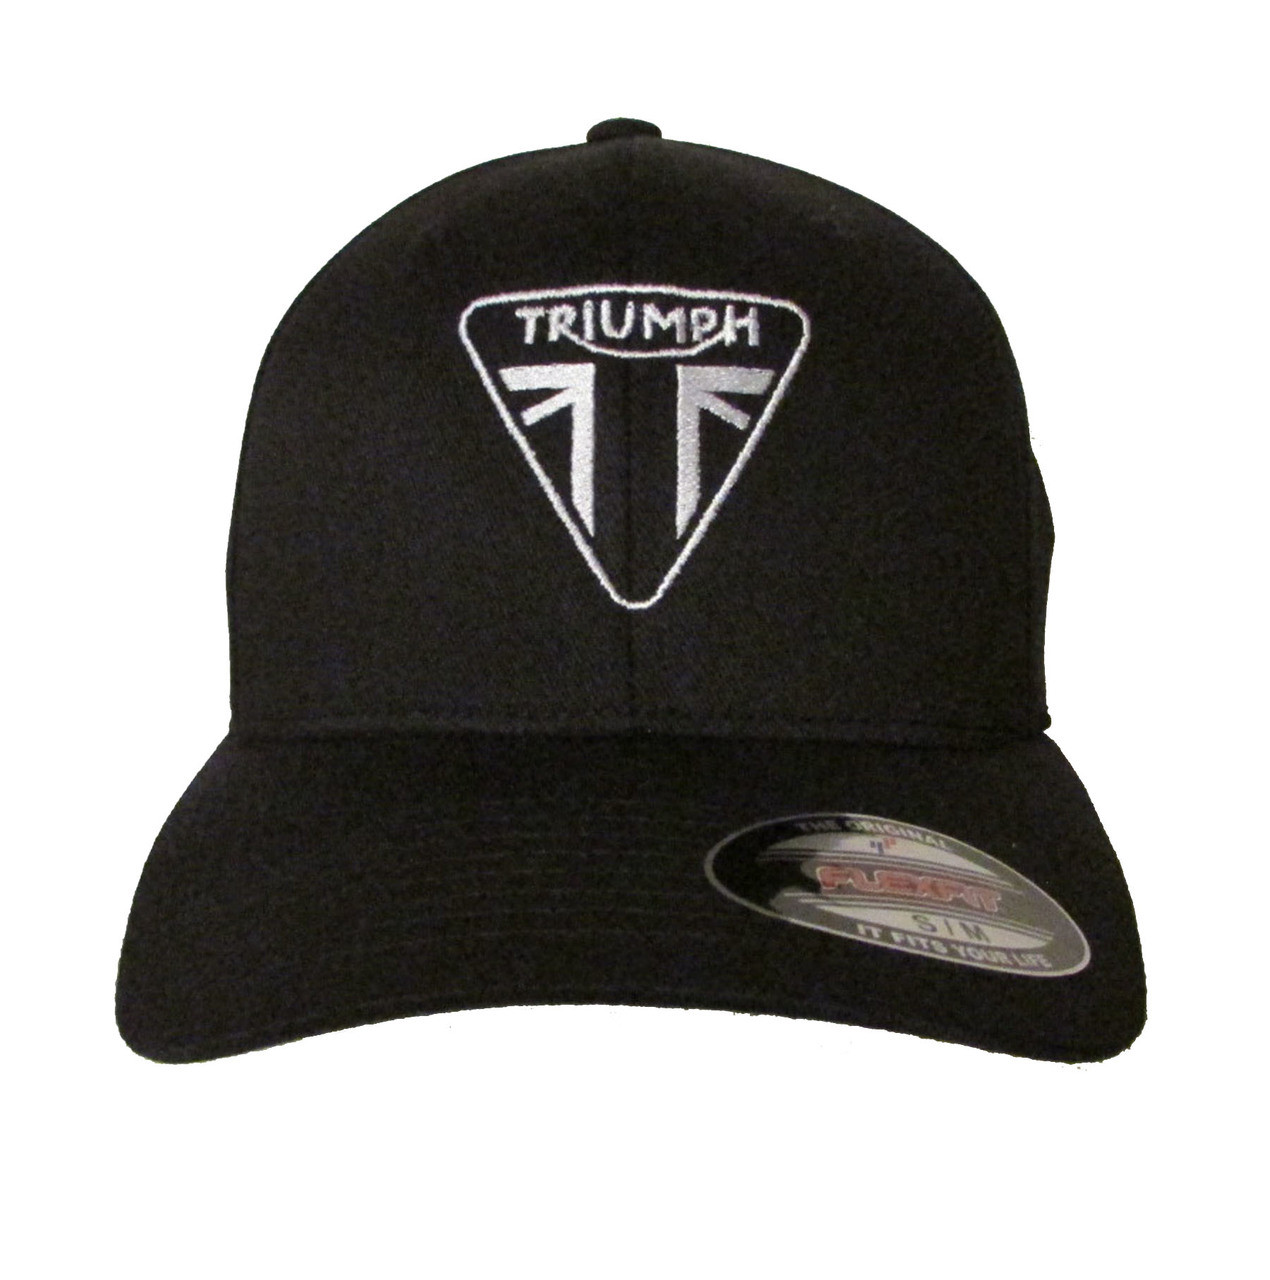 aaeb478229b03 Triumph Motorcycle Logo Embroidered Baseball Hat - Cap